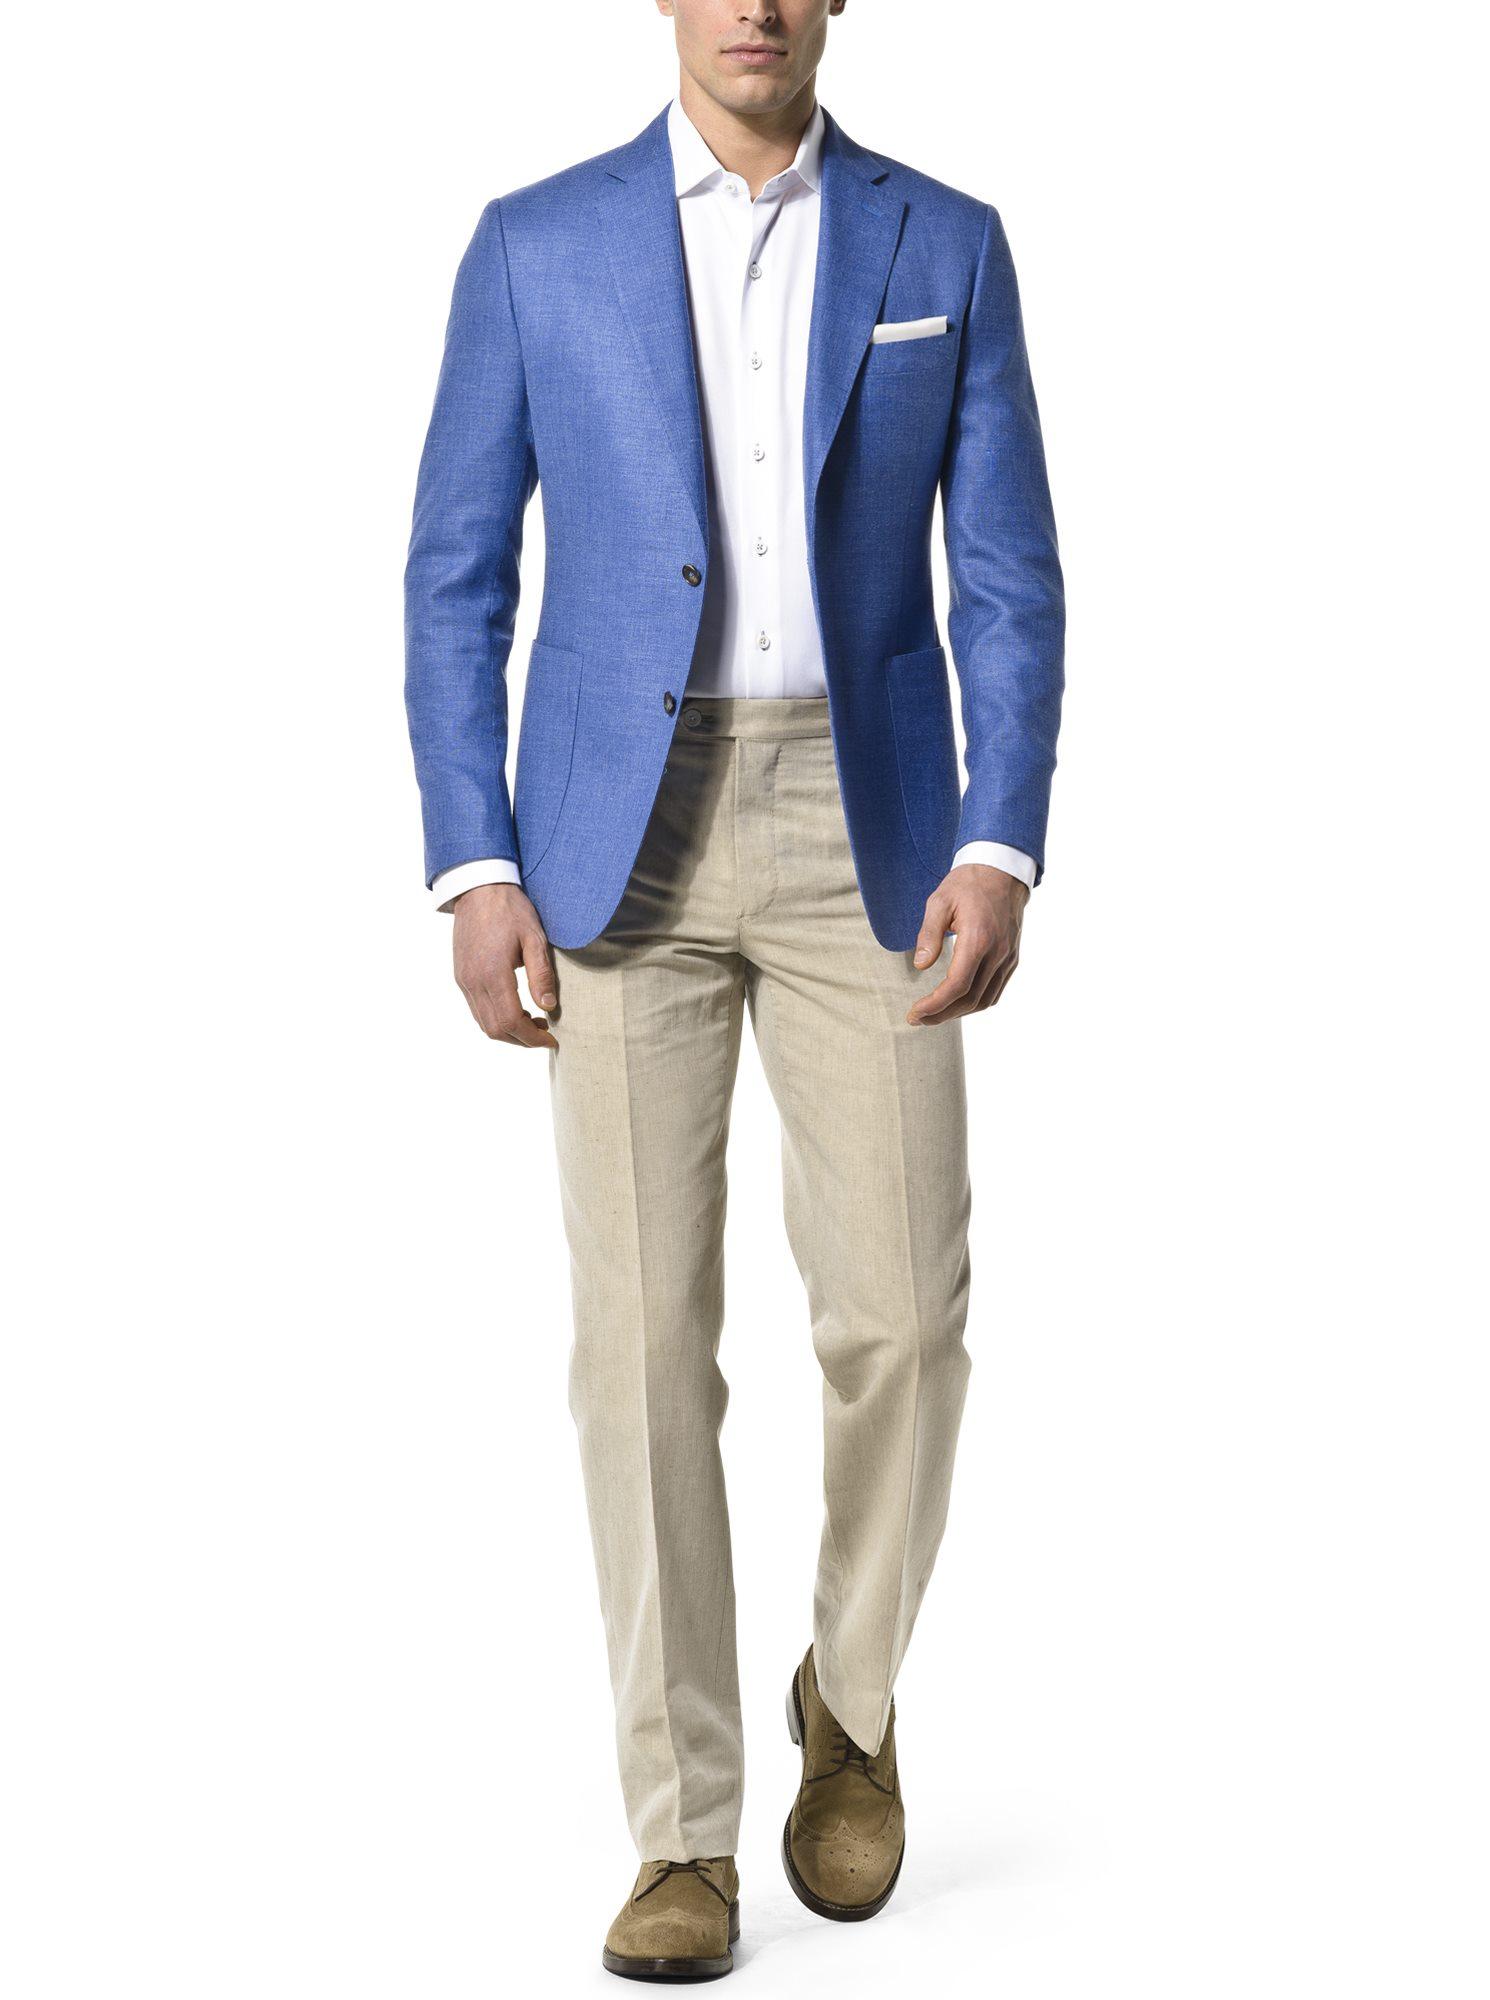 4121d813ab3 Royal Blue Wool Silk Linen Blend.  550 Add To Favorites